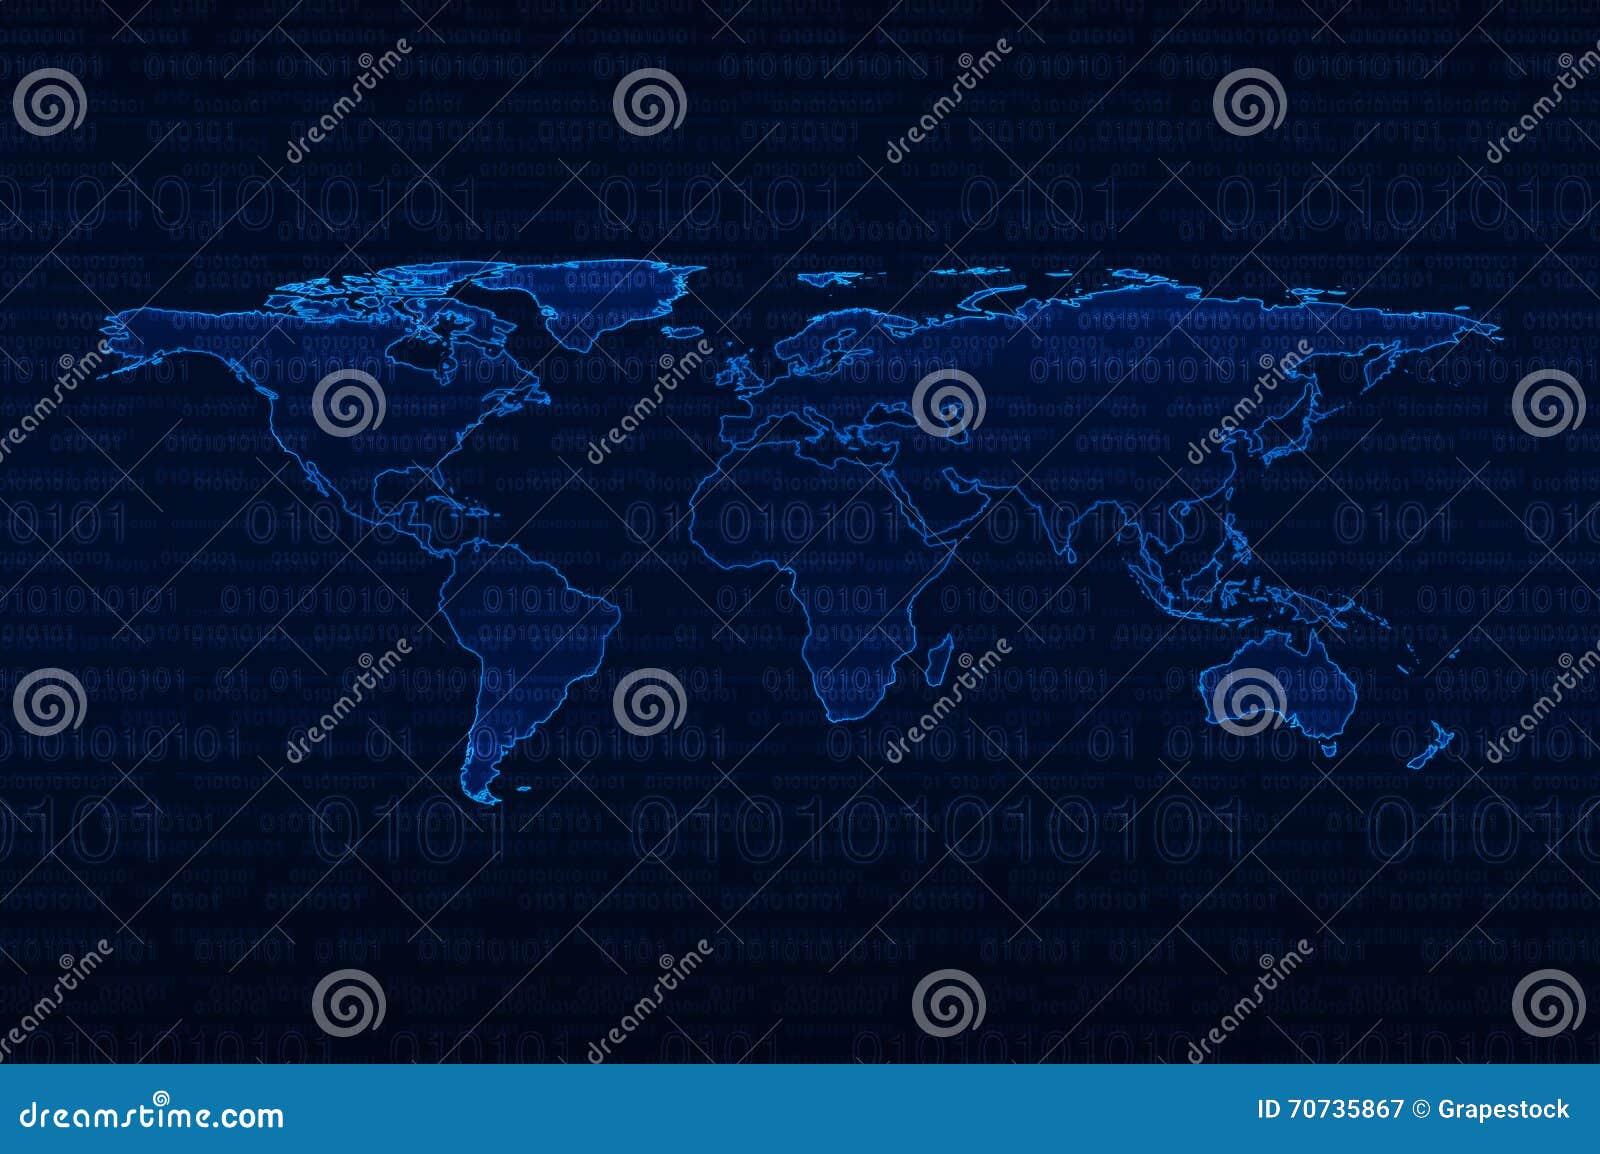 Digital world map over binary code background